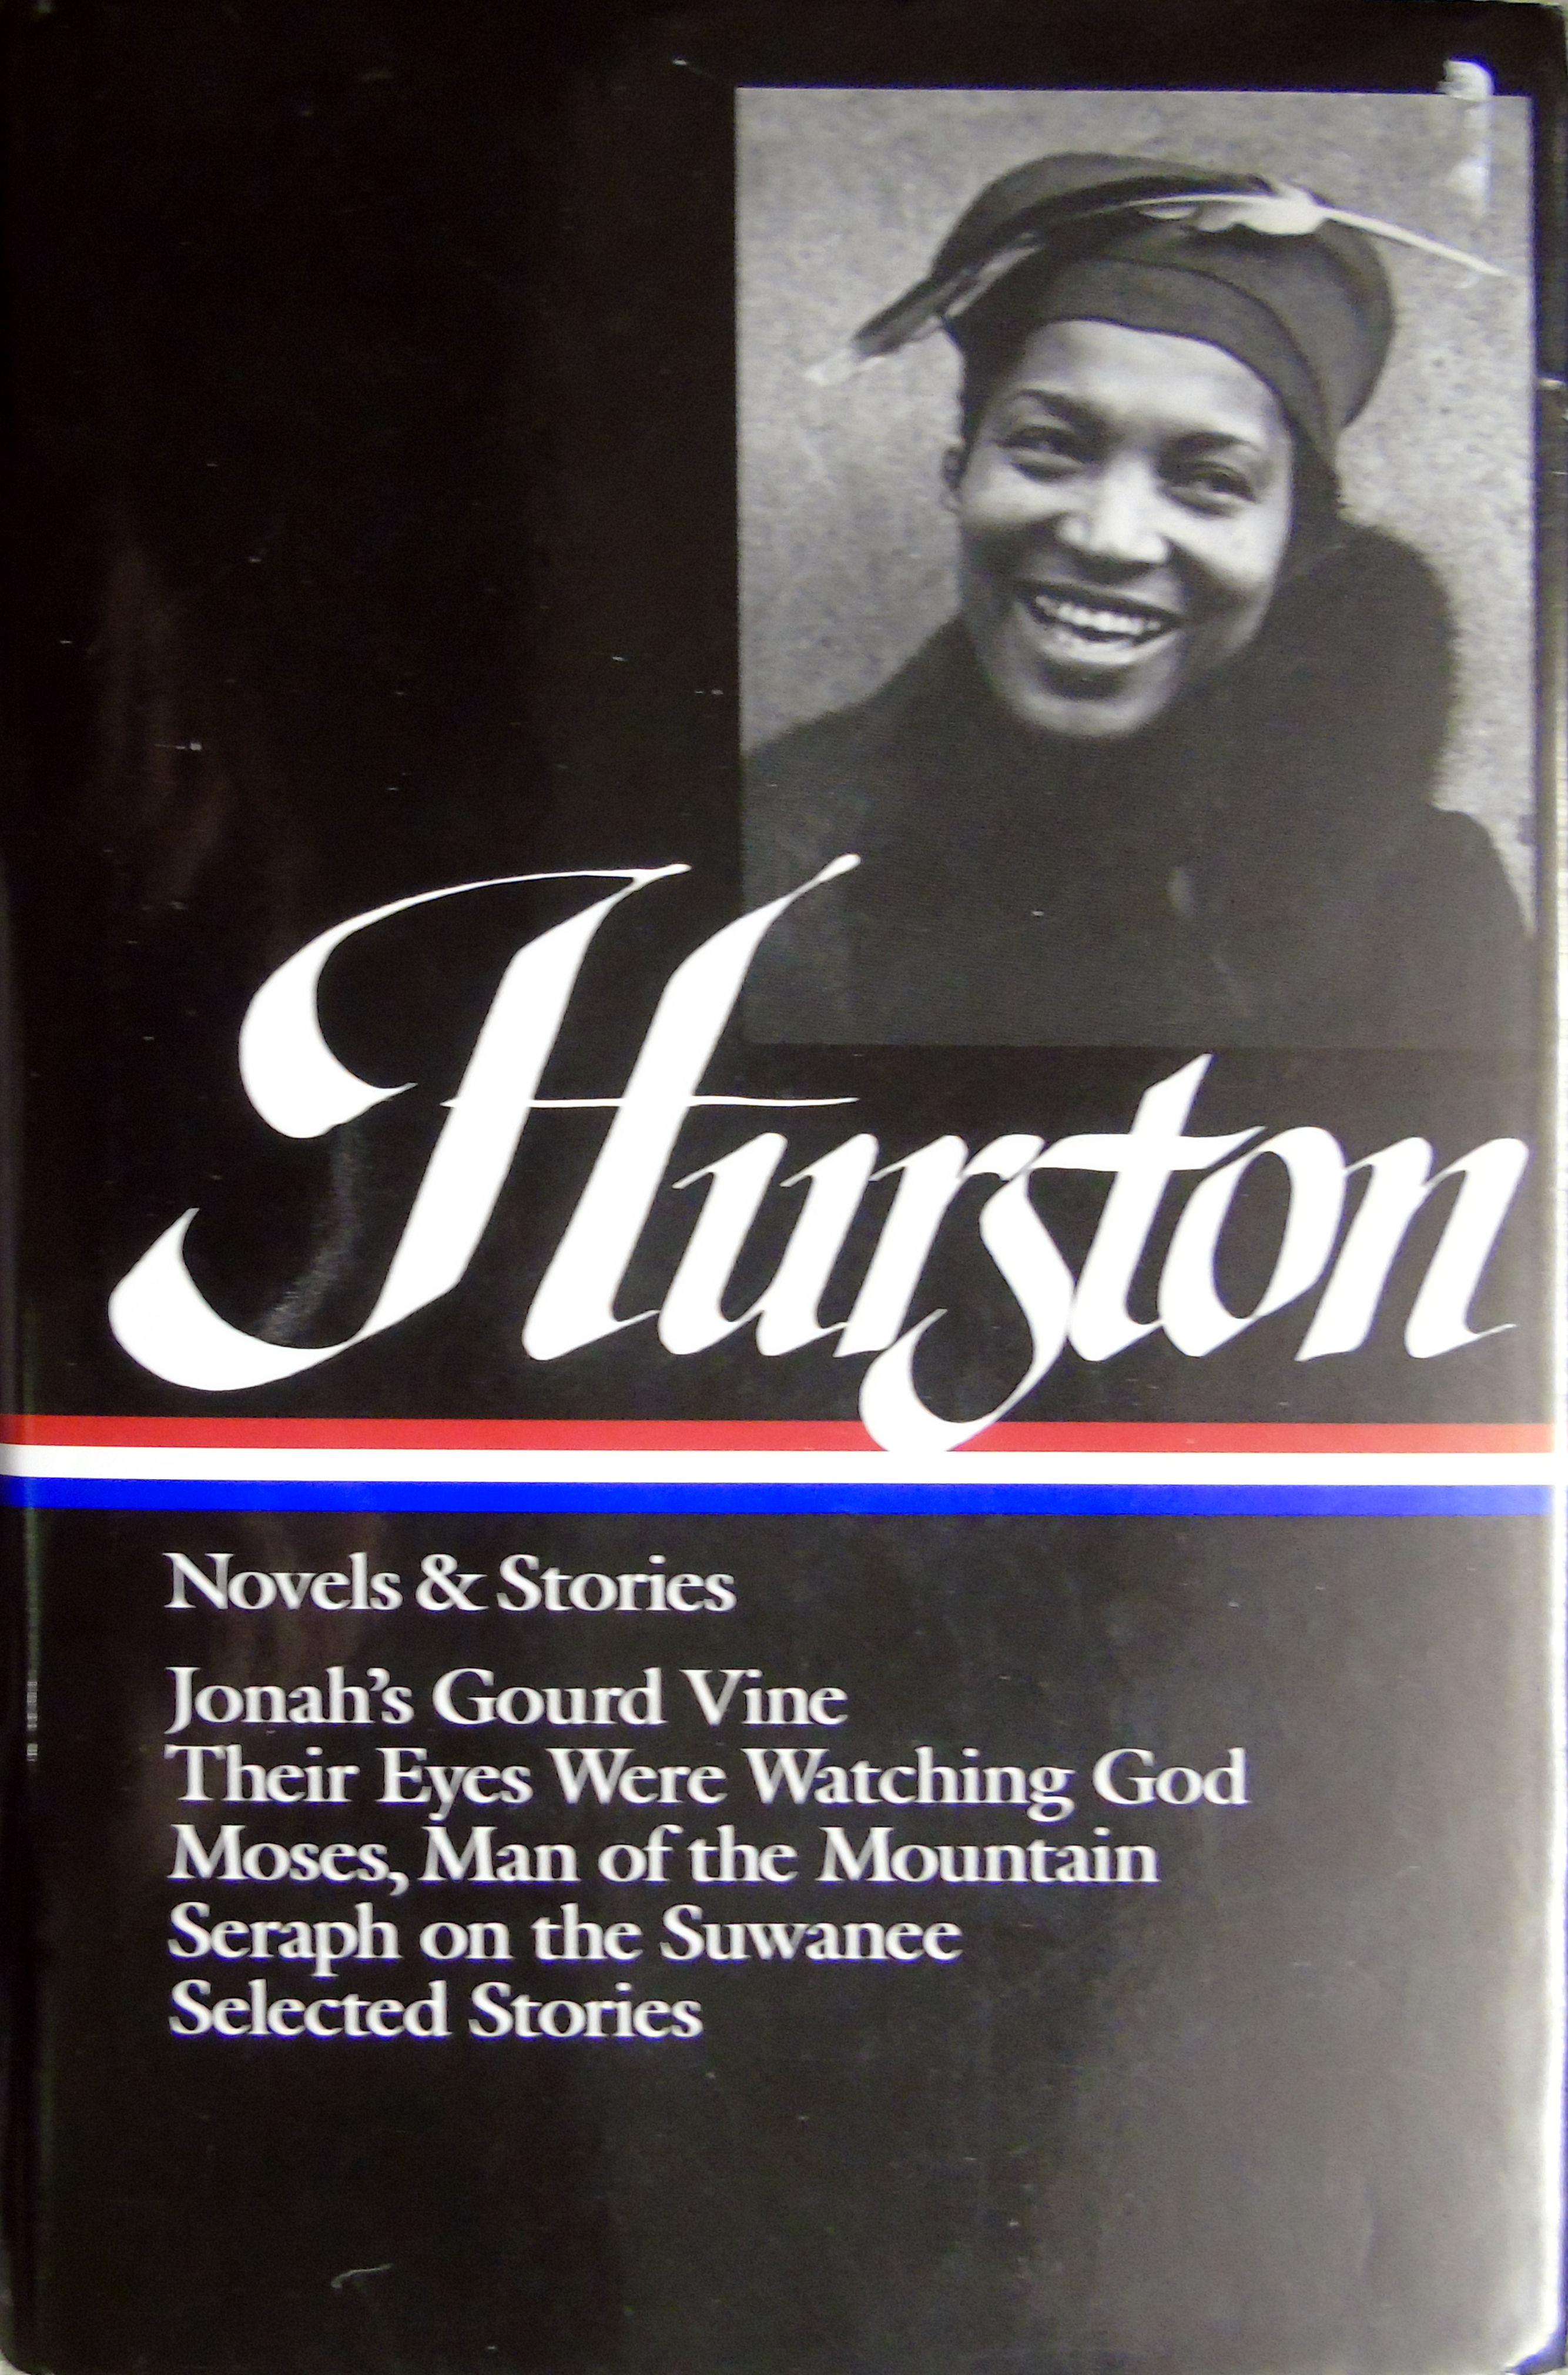 9780940450837 - Hurston: Novels and Stories by Zora Neale; Wall, Cheryl  Hurston